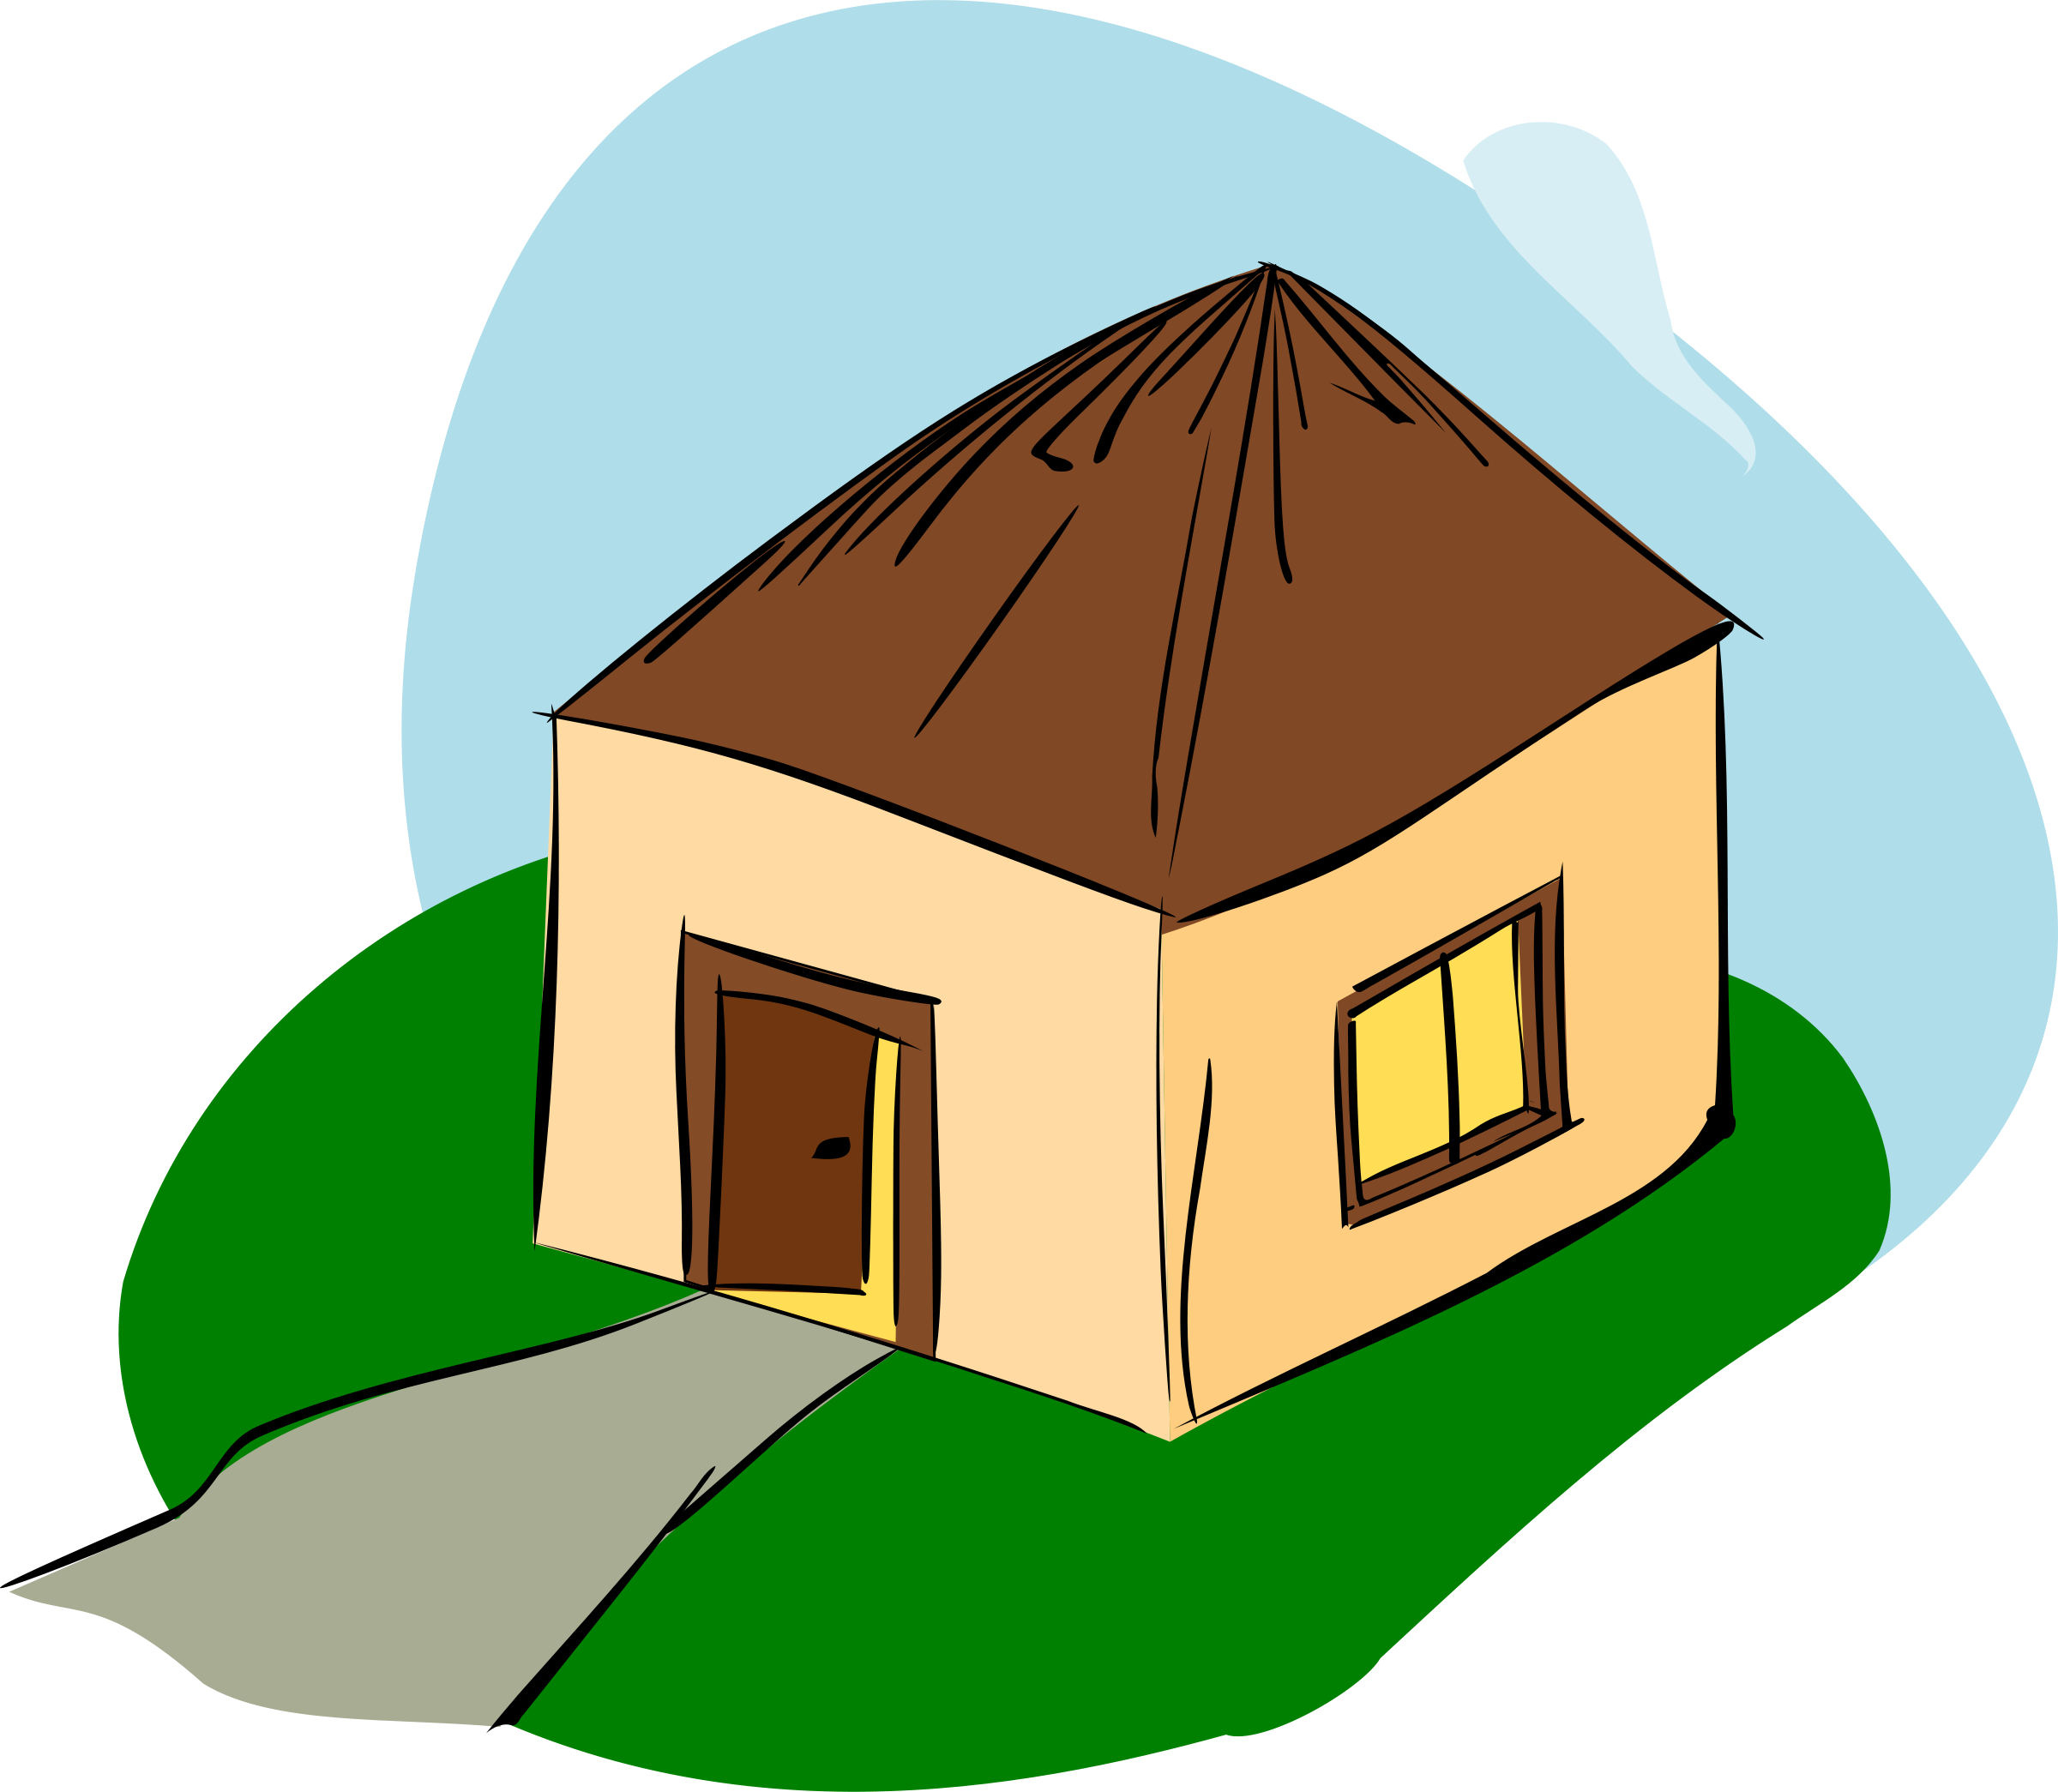 Free Hut Cliparts, Download Free Clip Art, Free Clip Art on.